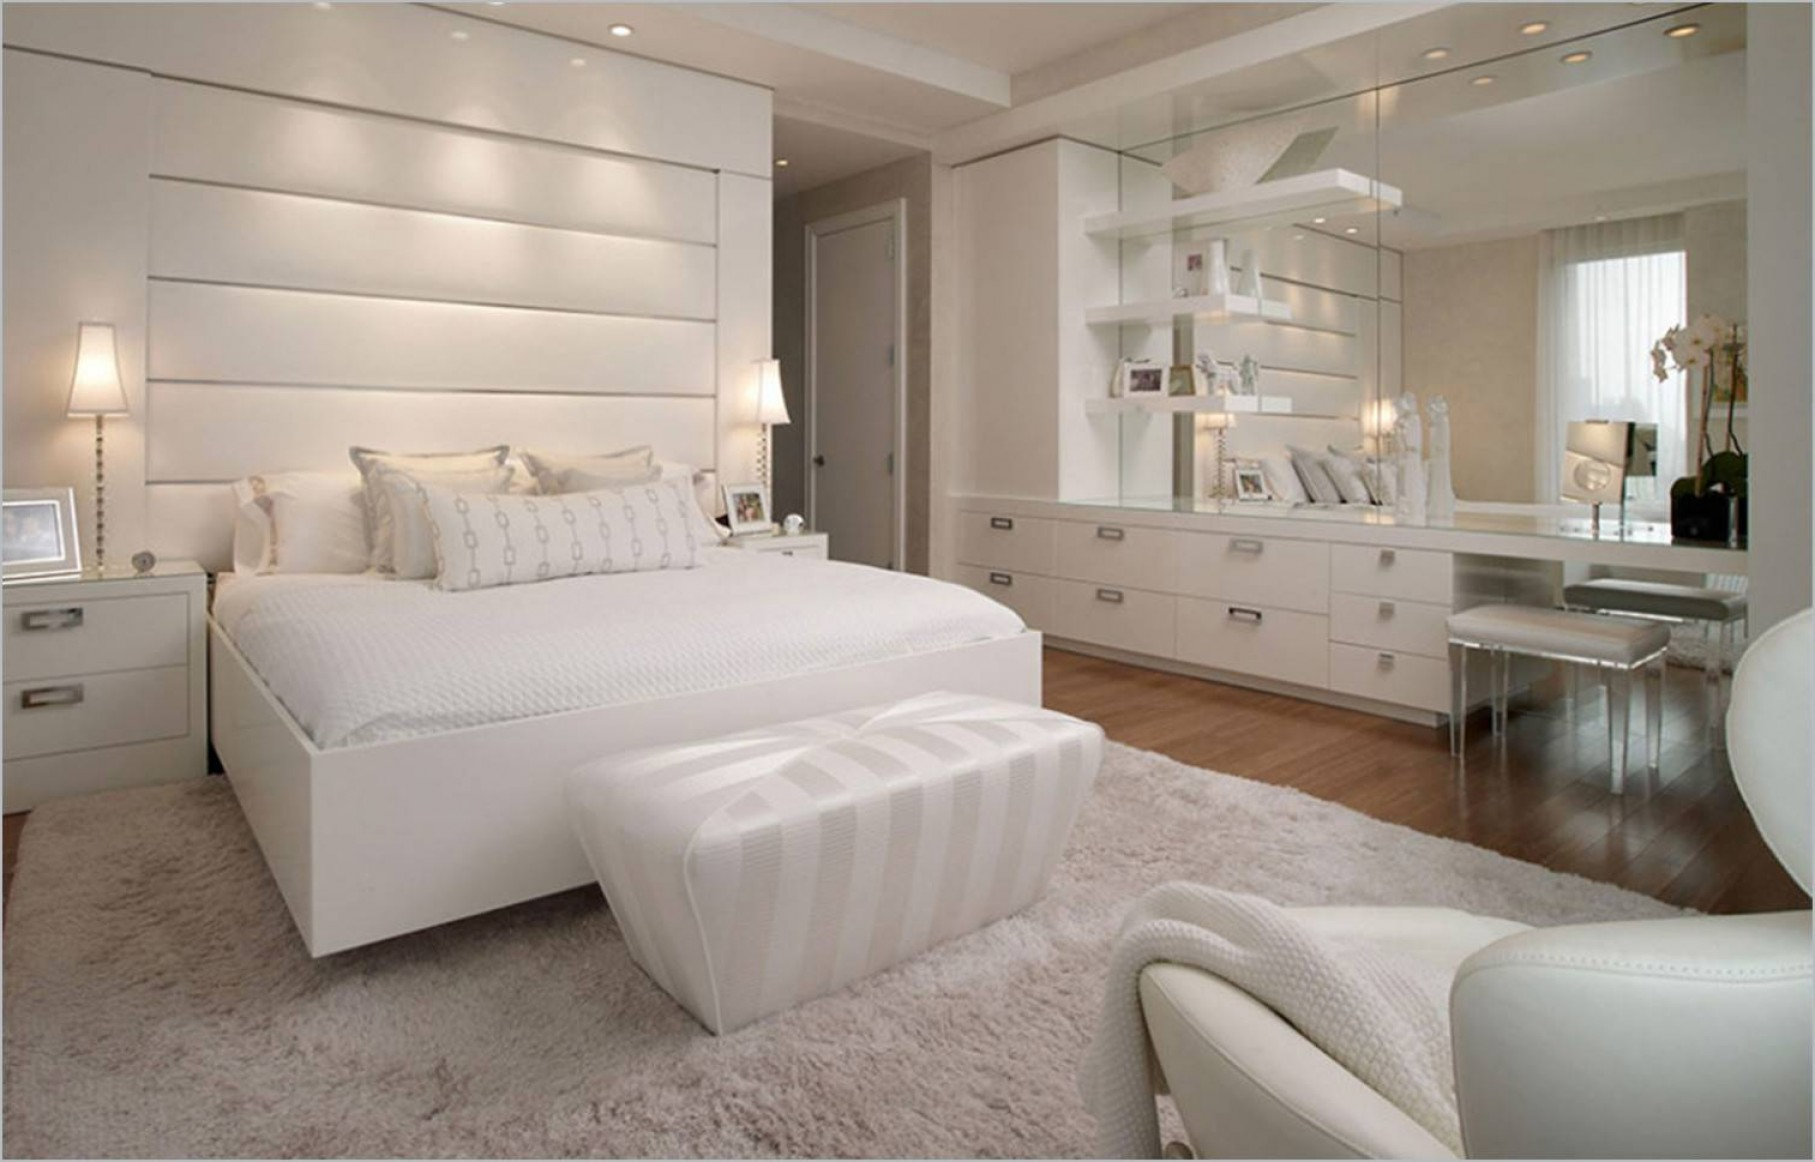 ergonomic living room furniture cozy bedroom interior design ideas - 4 Easy Tips To Make Your Bedroom Feel Cozy